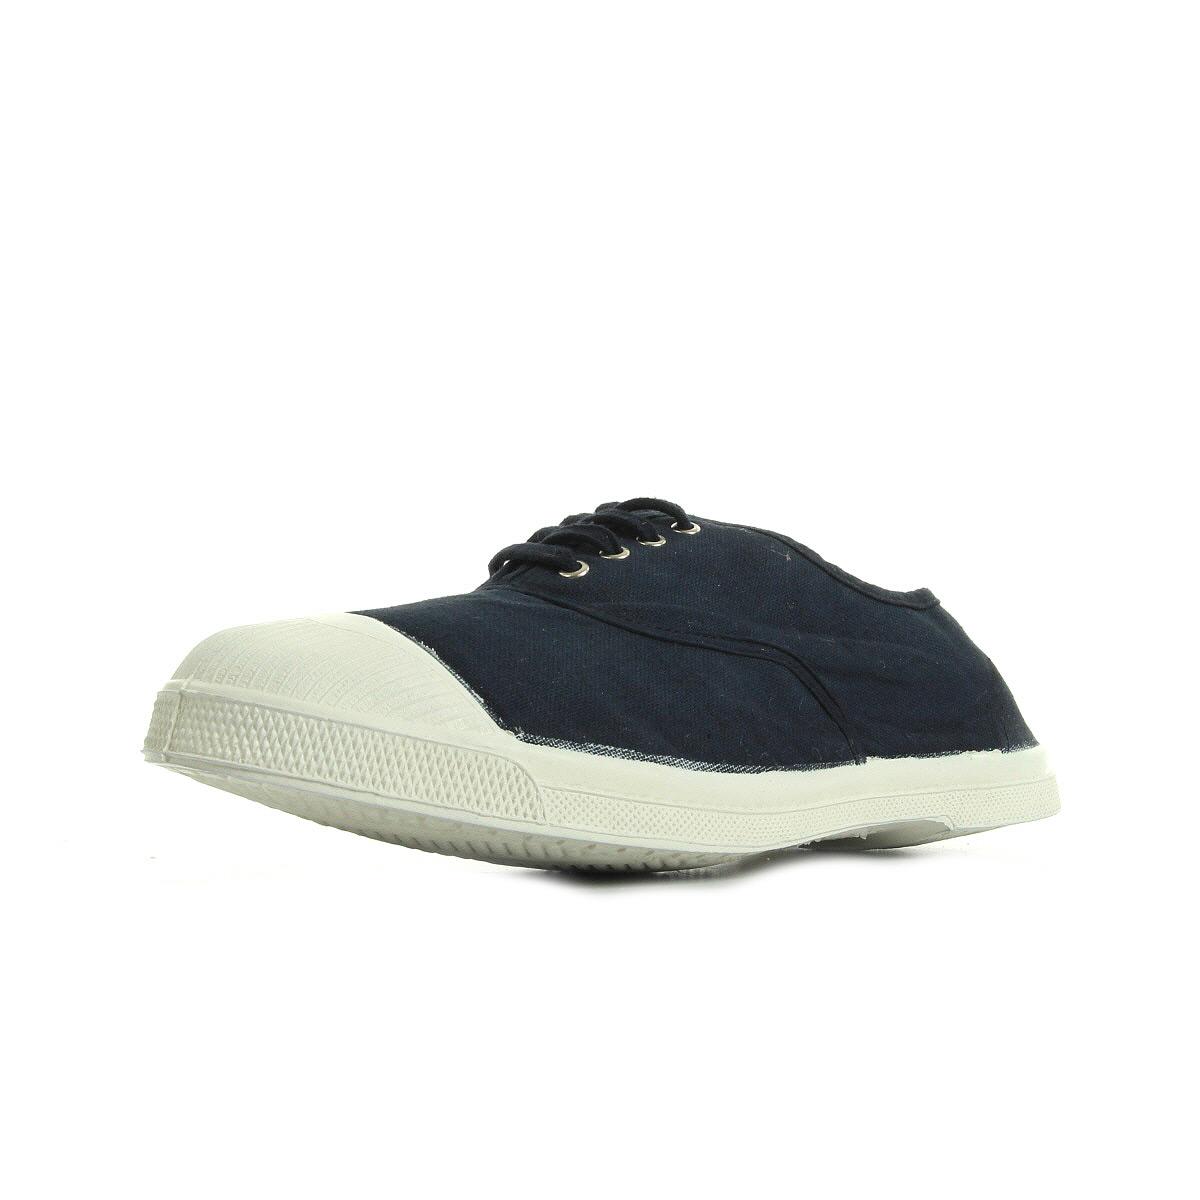 3a88b1147b49a Details about Chaussures Baskets Bensimon homme Ten Lacets Homme taille Bleu  marine Bleue